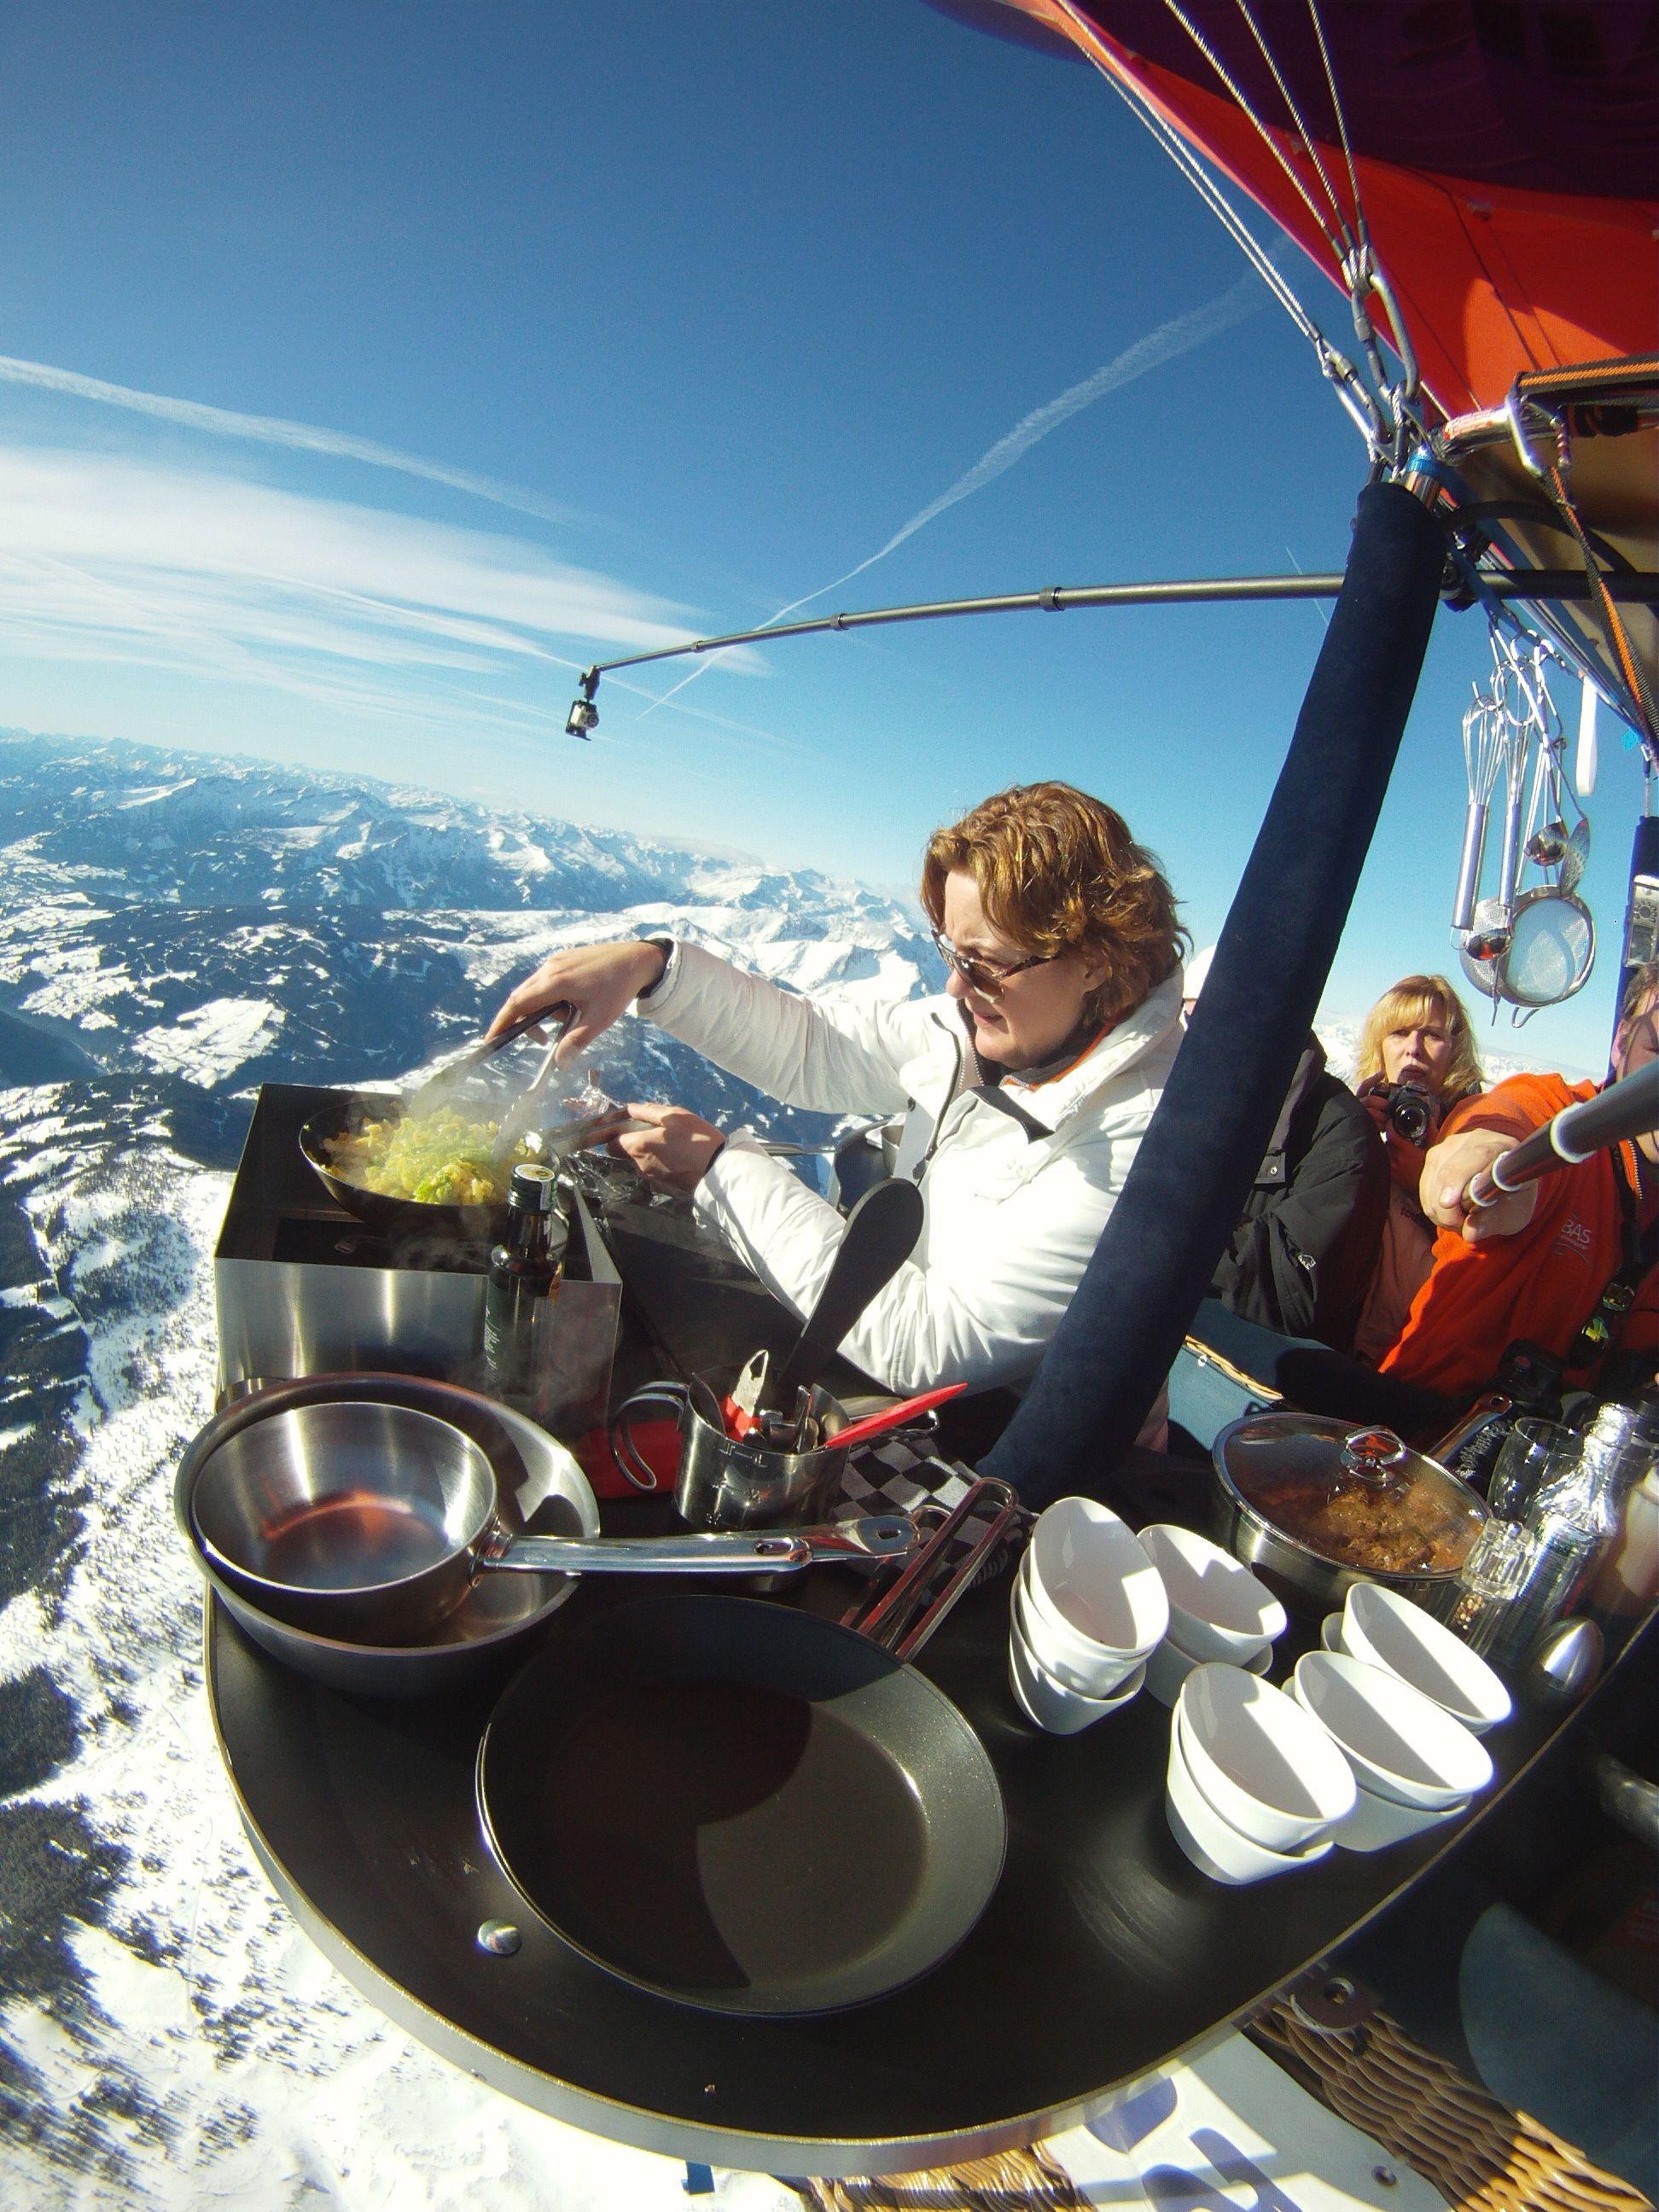 CuliAir op 4 km hoogte letterlijk koken in (de warmte